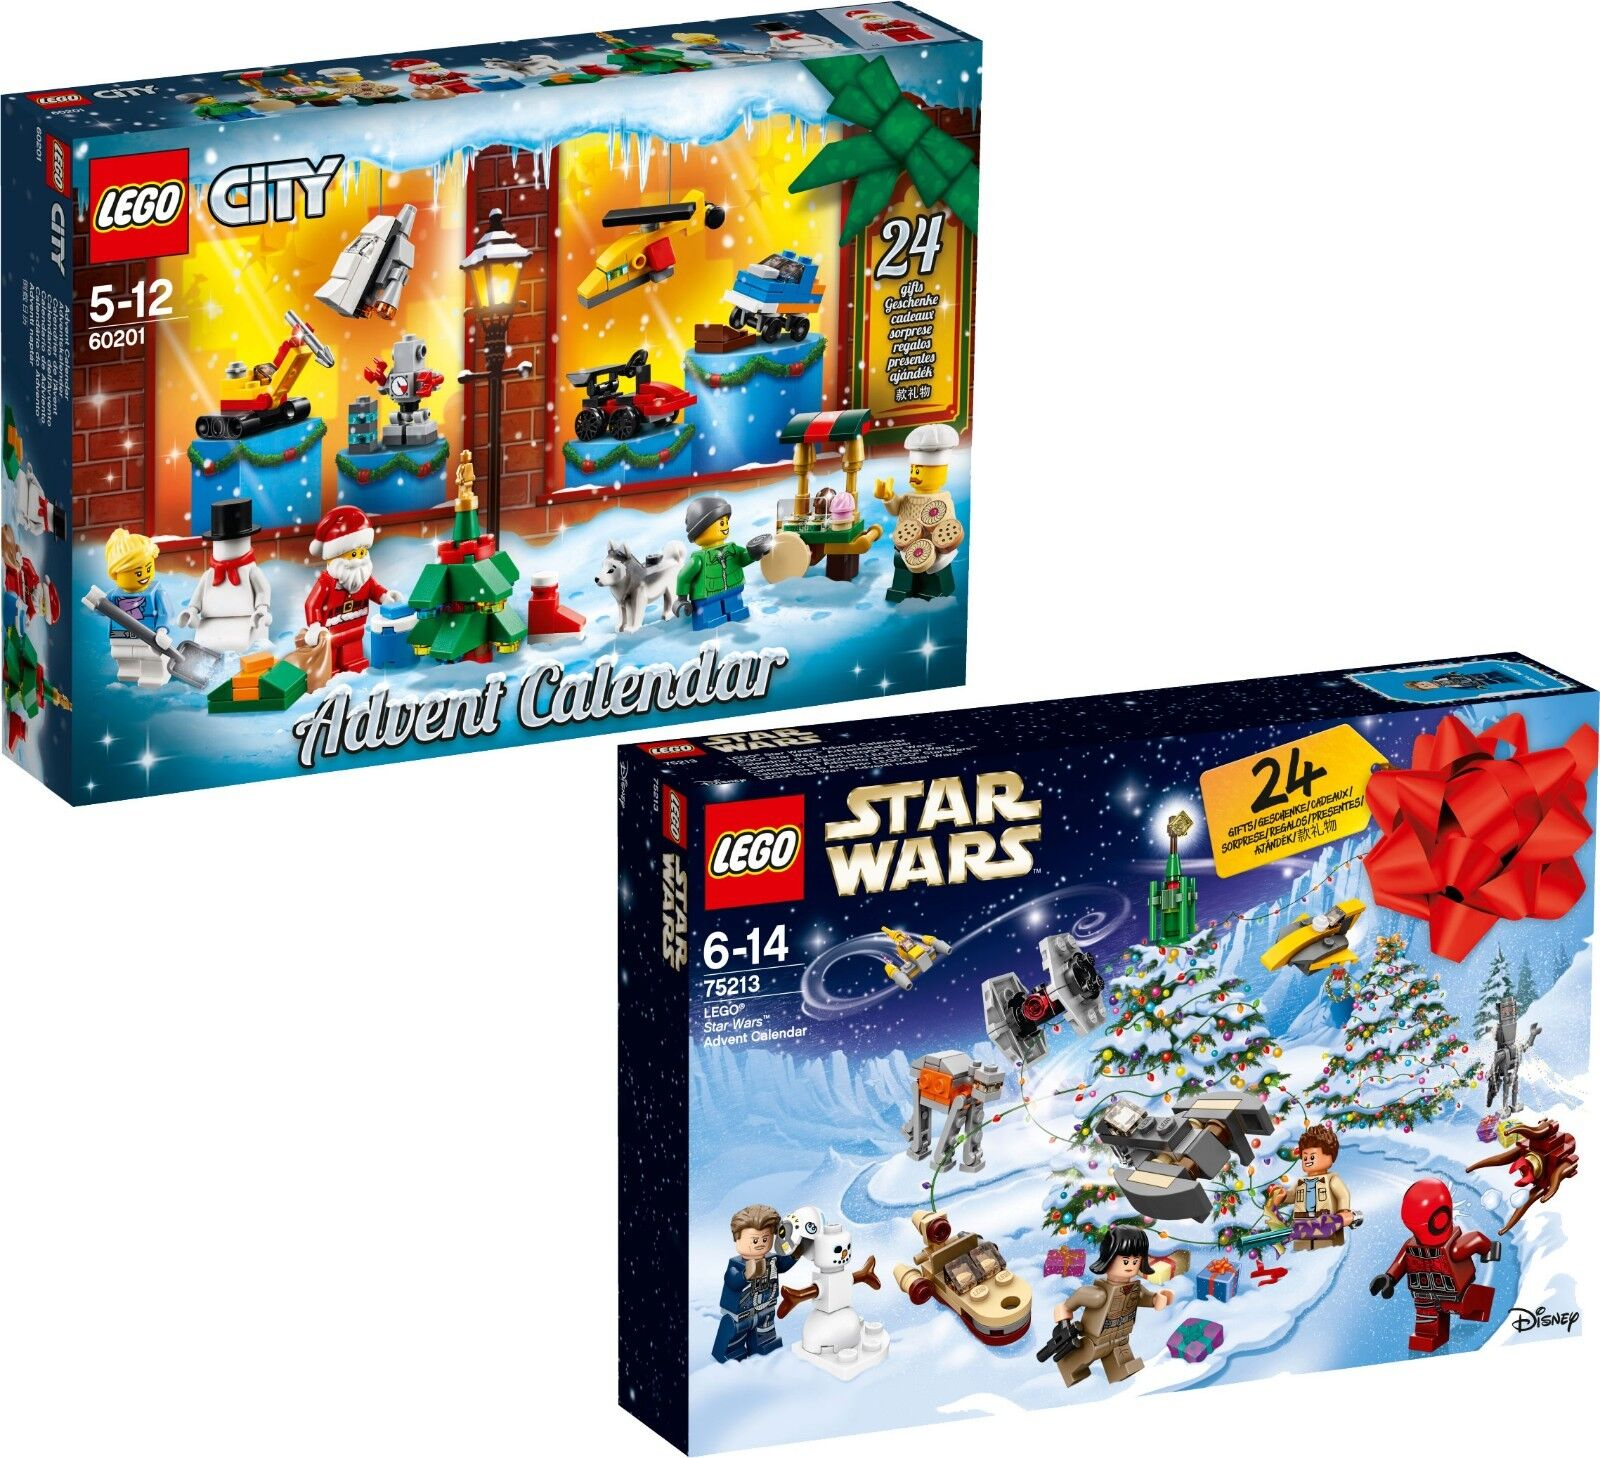 LEGO Adventskalender  60201 City + 75213 Star Wars N9 18